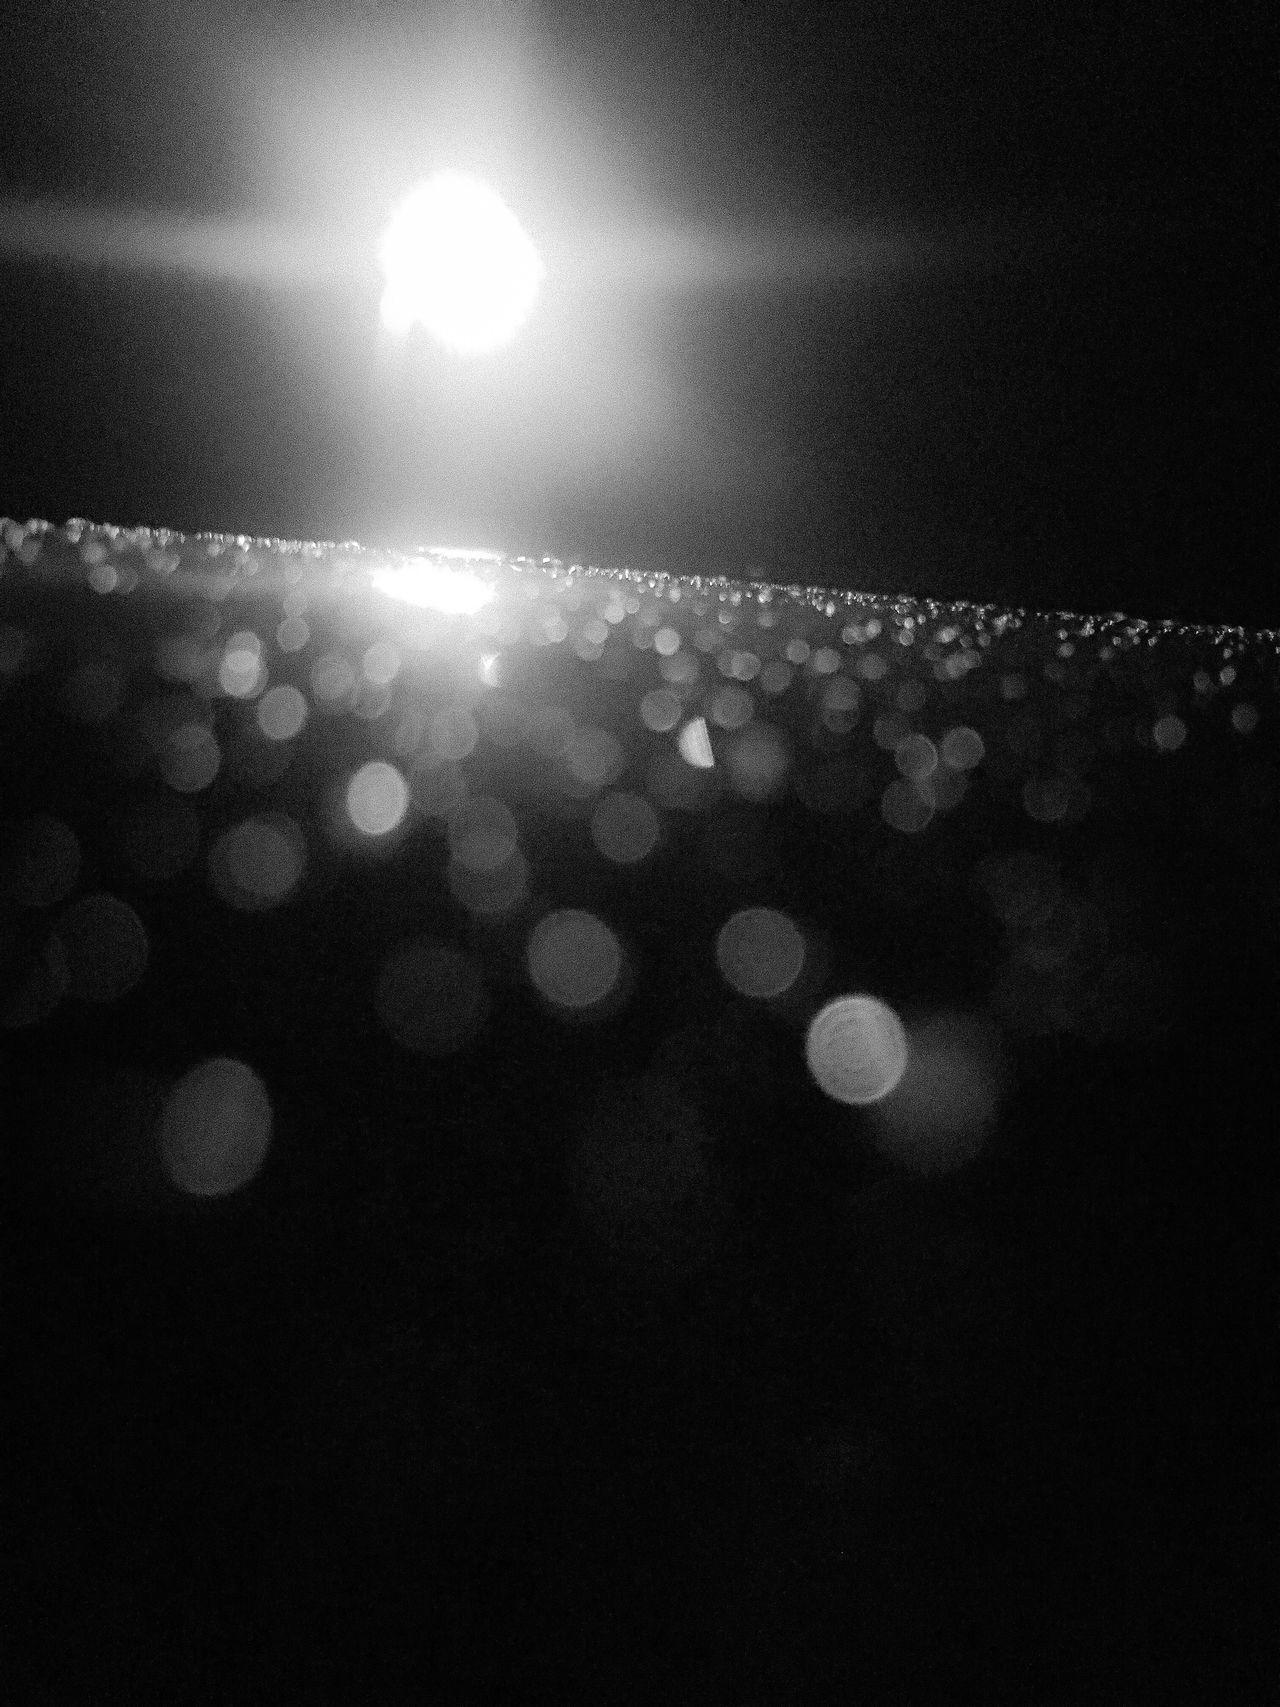 Illuminated Night No People Dark Low Angle View Close-up Light Sky Nature Indoors  Light Effect Street Light EyeEm Best Shots The Week Of Eyeem Fresh On Eyeem  Freshness RainDrop Water Refection Metallic Minimalist Black And White Photography